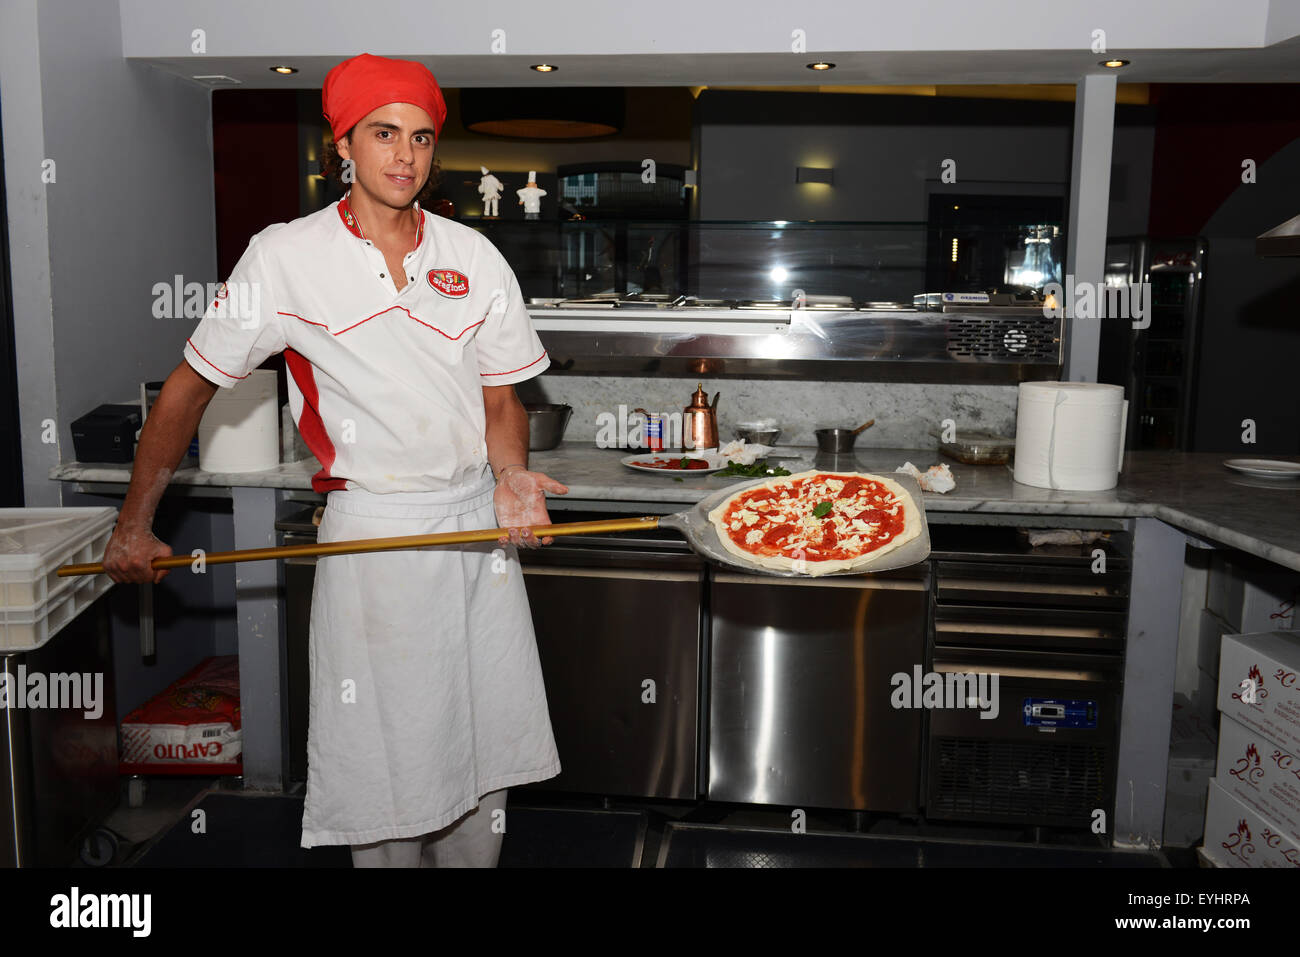 Alessandro Izzo, the pizza chef of pizzeria Palazzo Petrucci in the center of Naples. - Stock Image